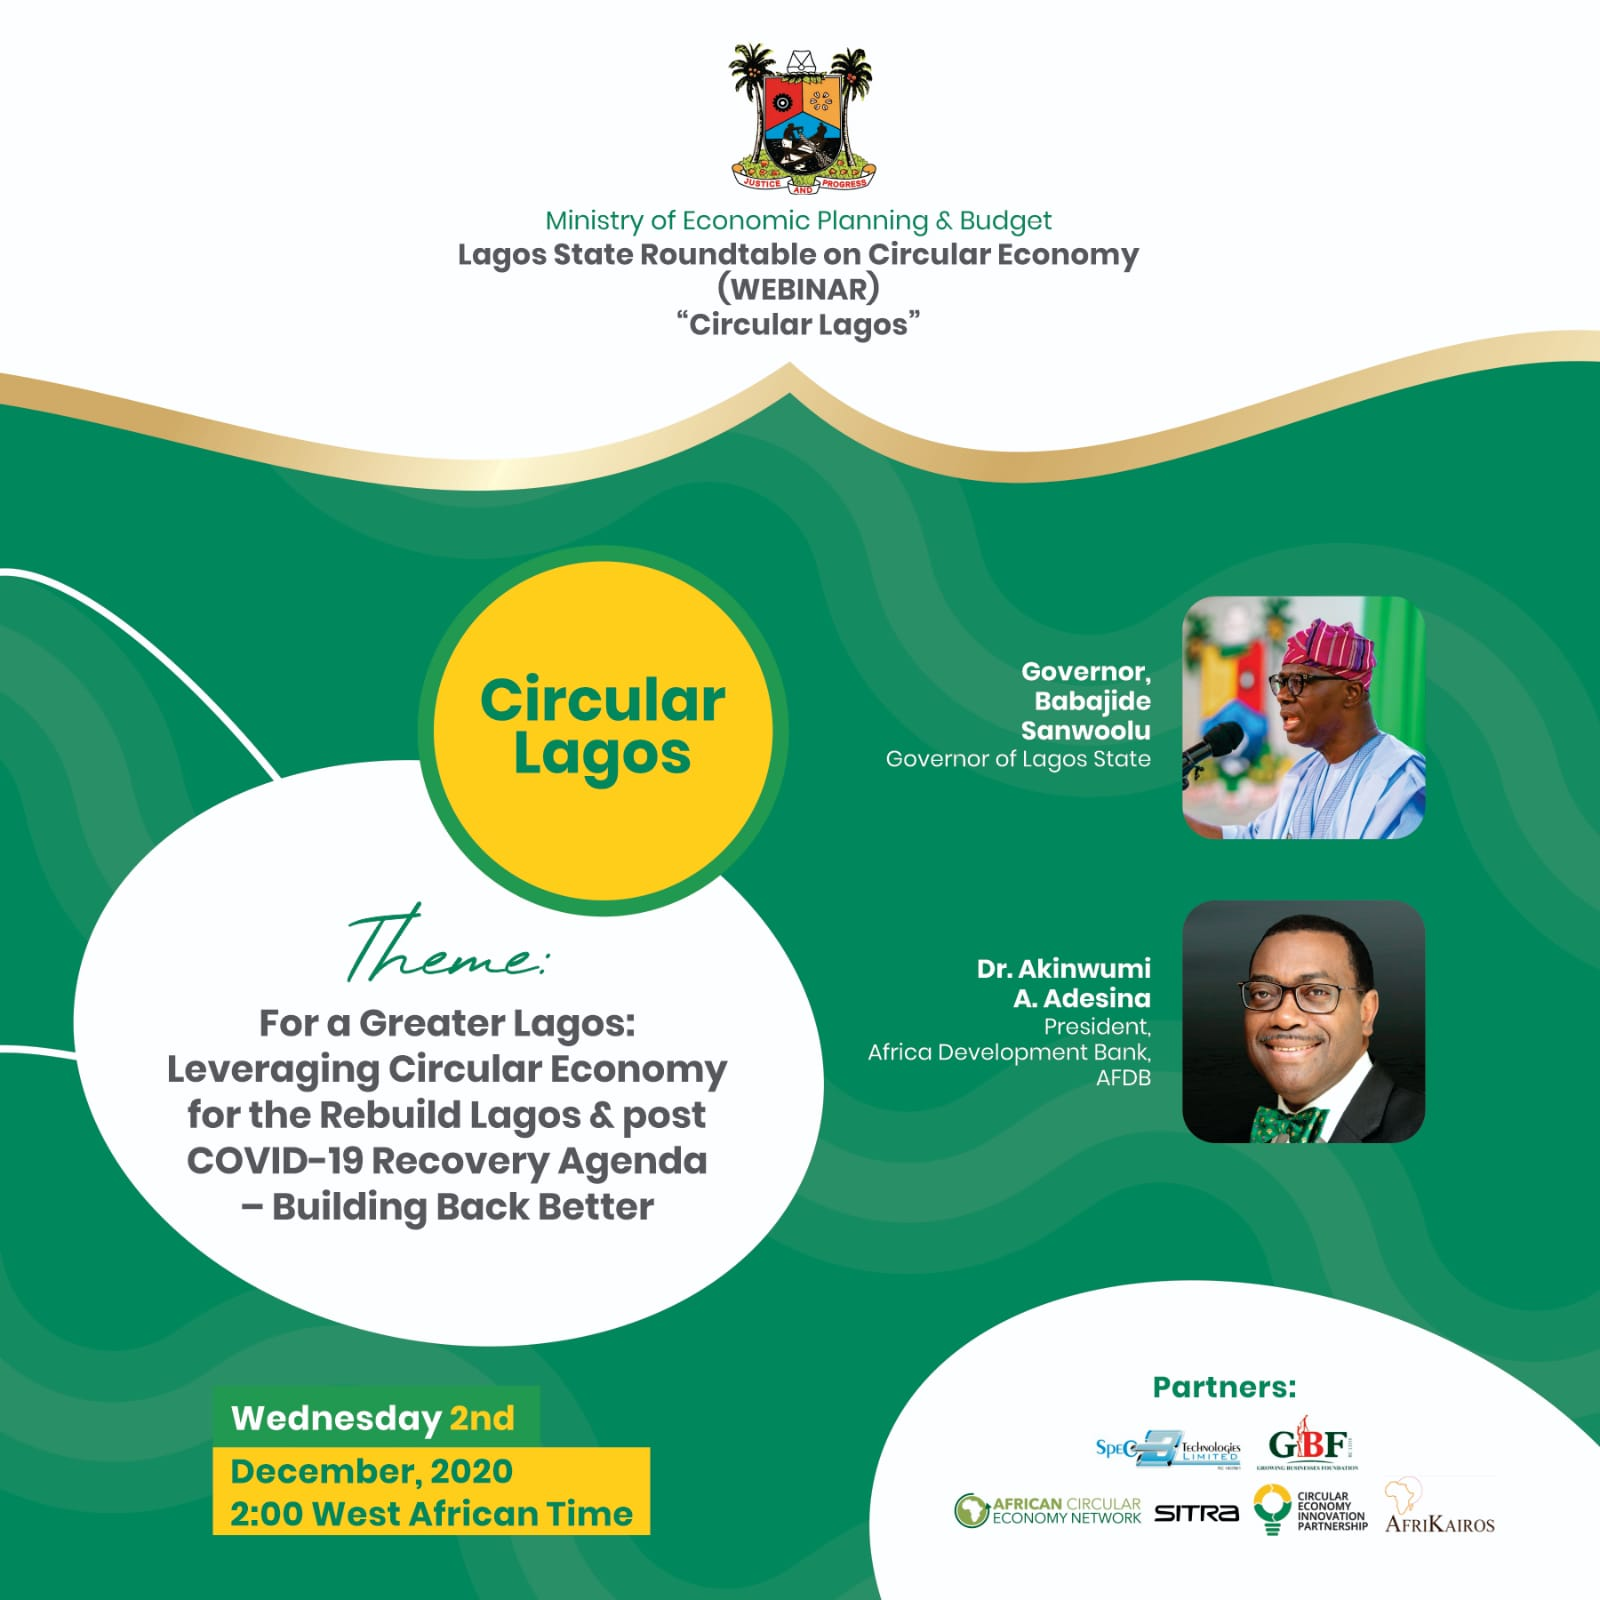 LagosMEPB